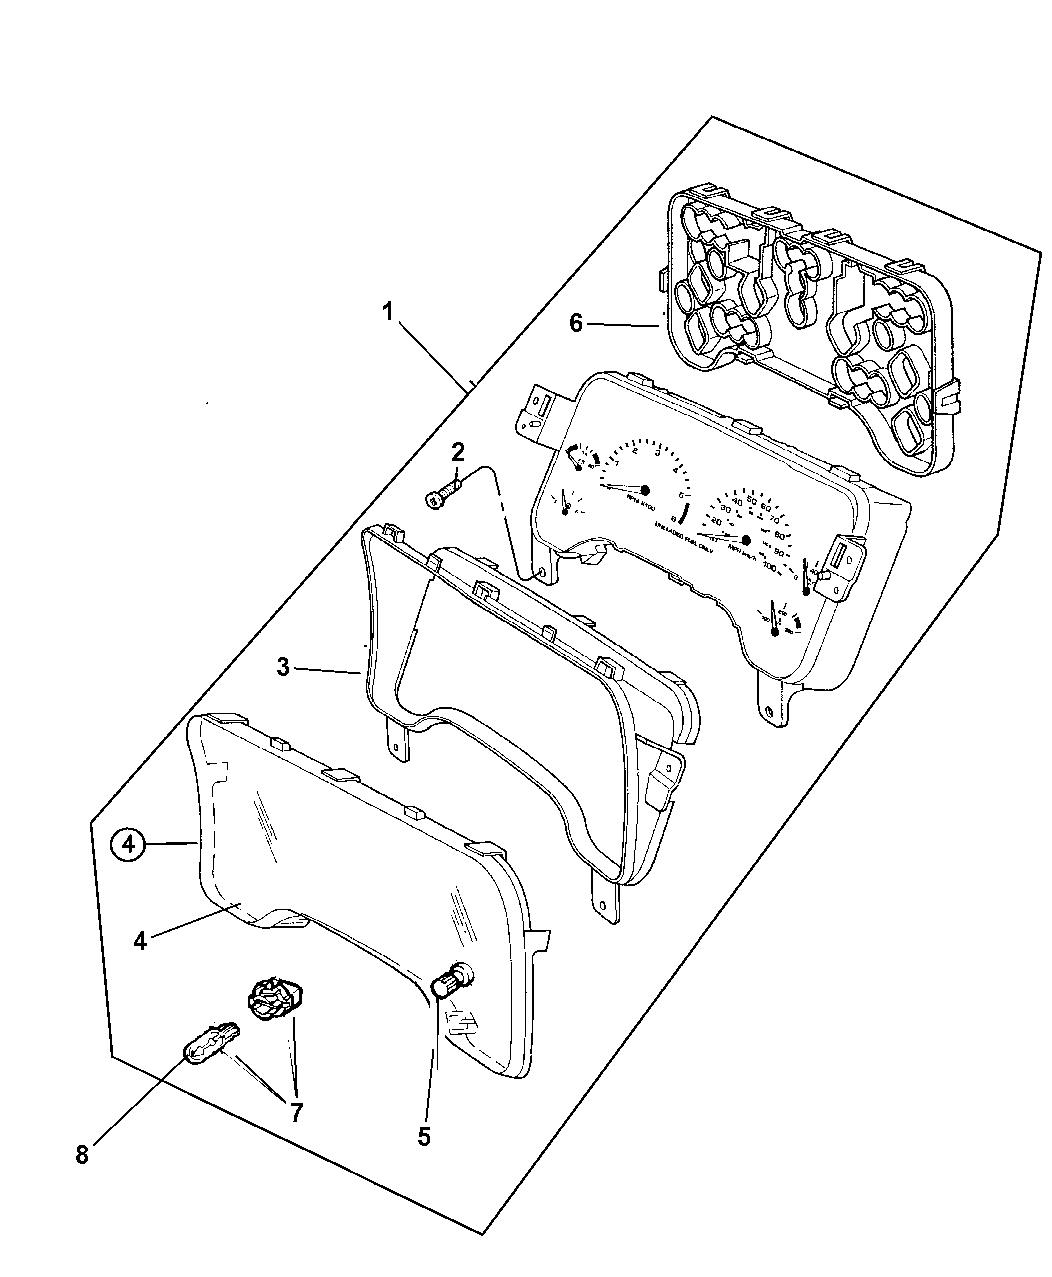 Jeep Wrangler Instrument Cluster